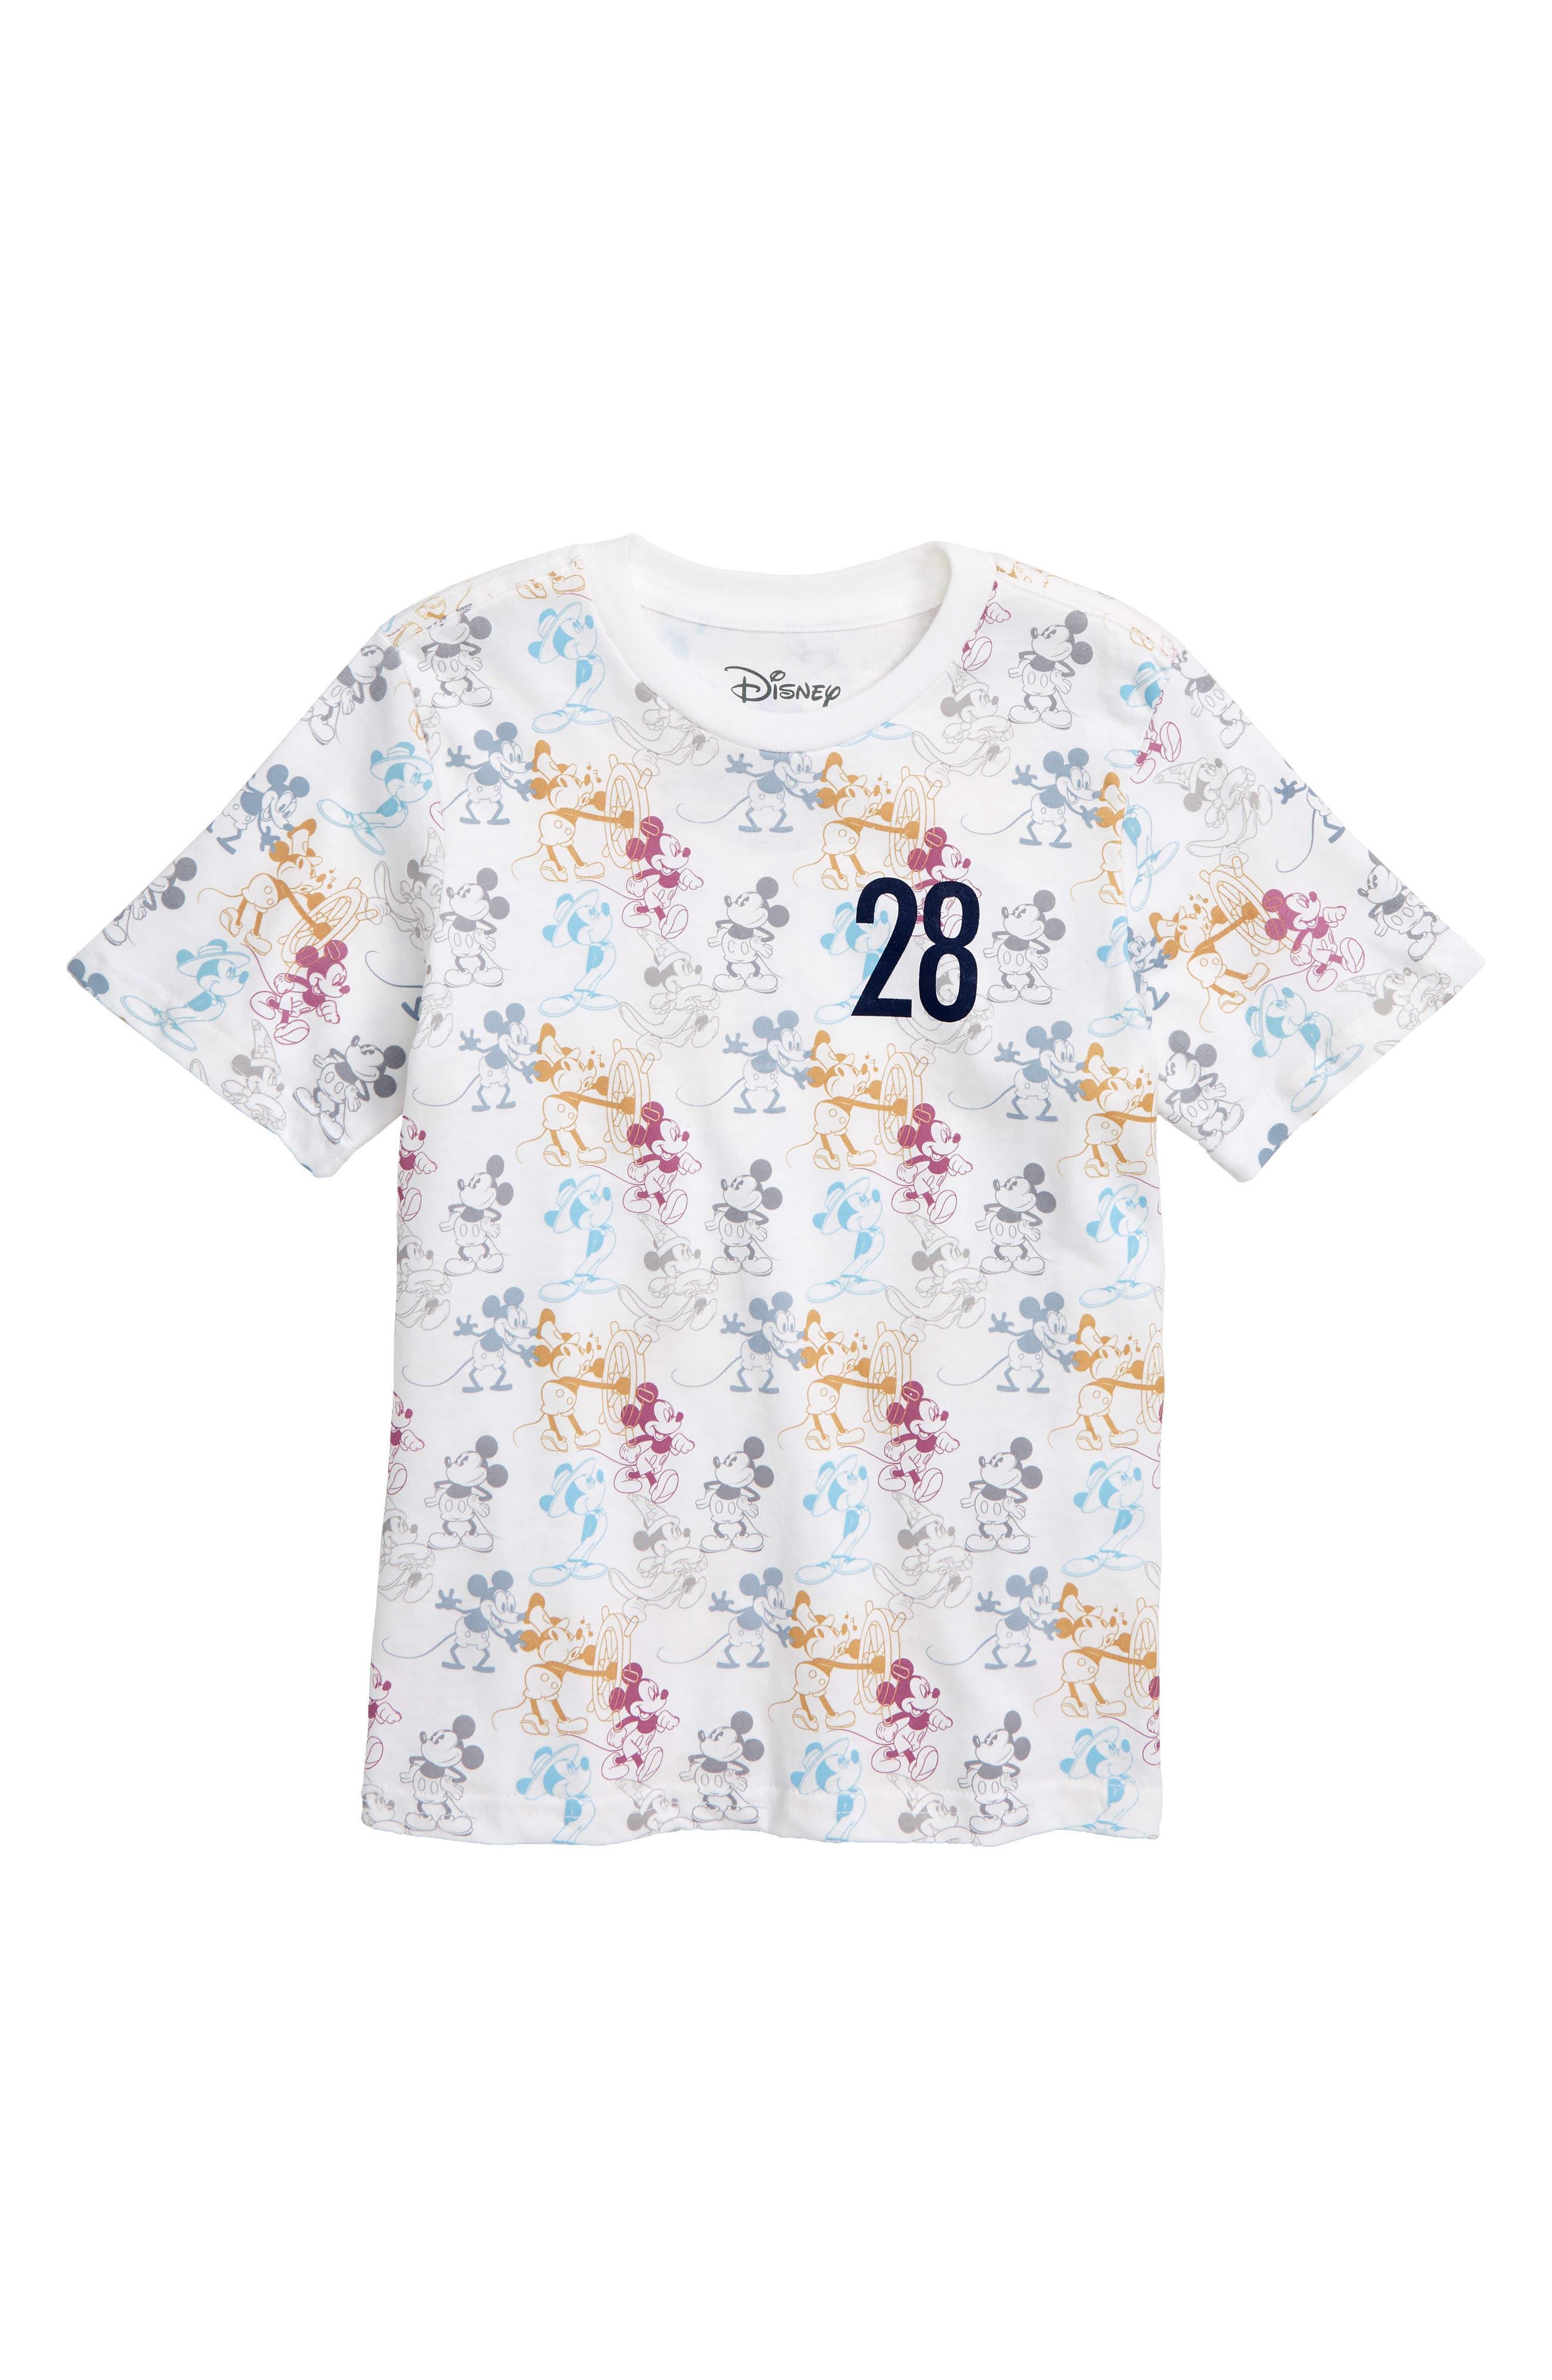 Disney<sup>®</sup> Mickey Mouse T-Shirt,                             Main thumbnail 1, color,                             100